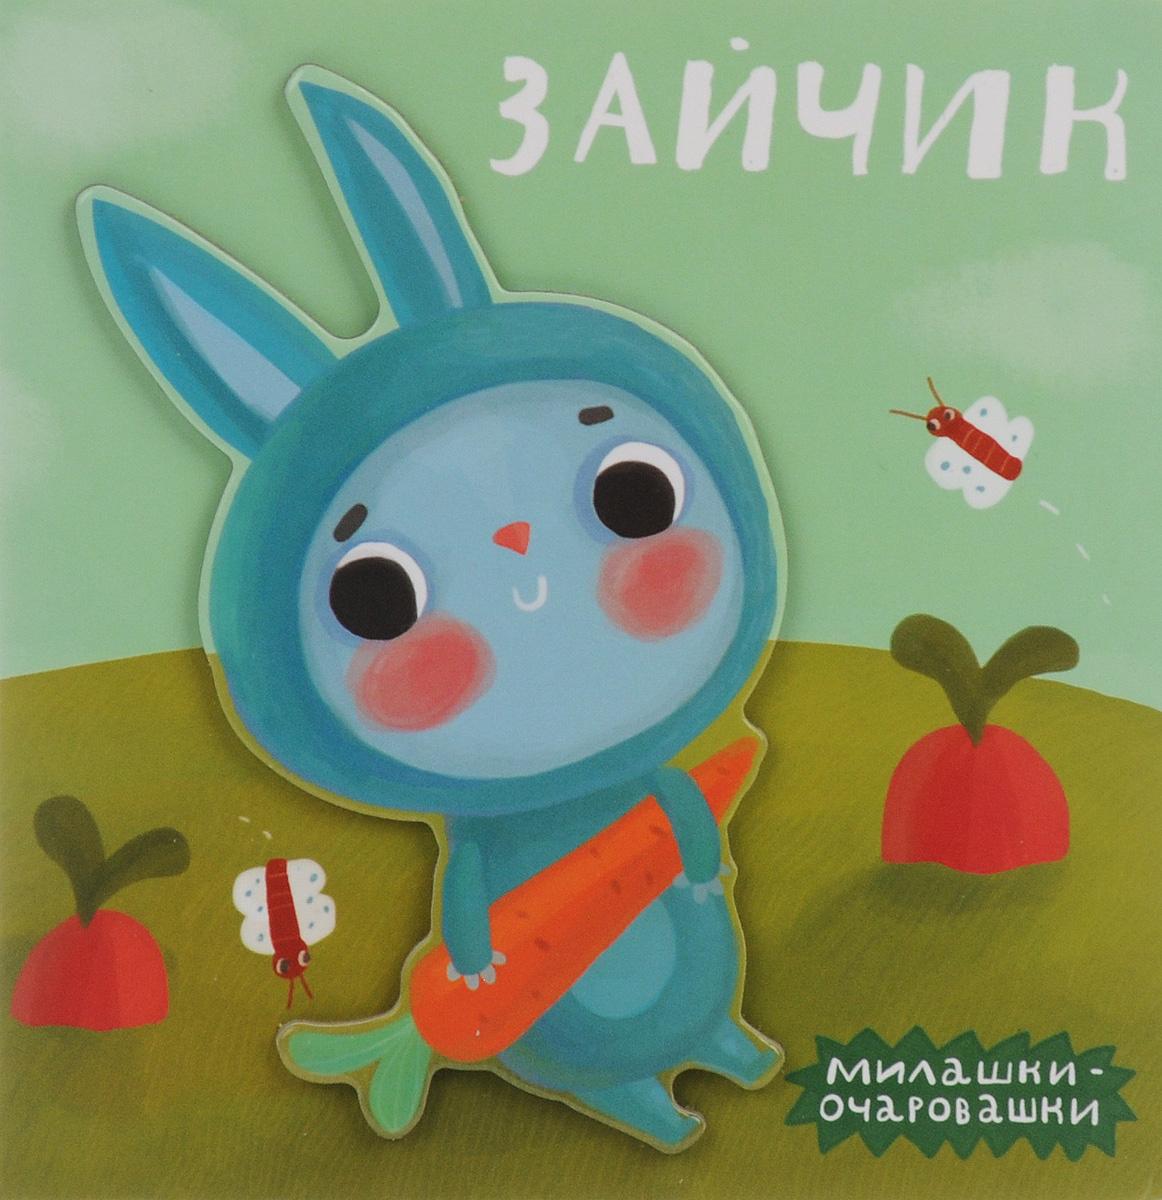 Зайчик | Романова Мария #1